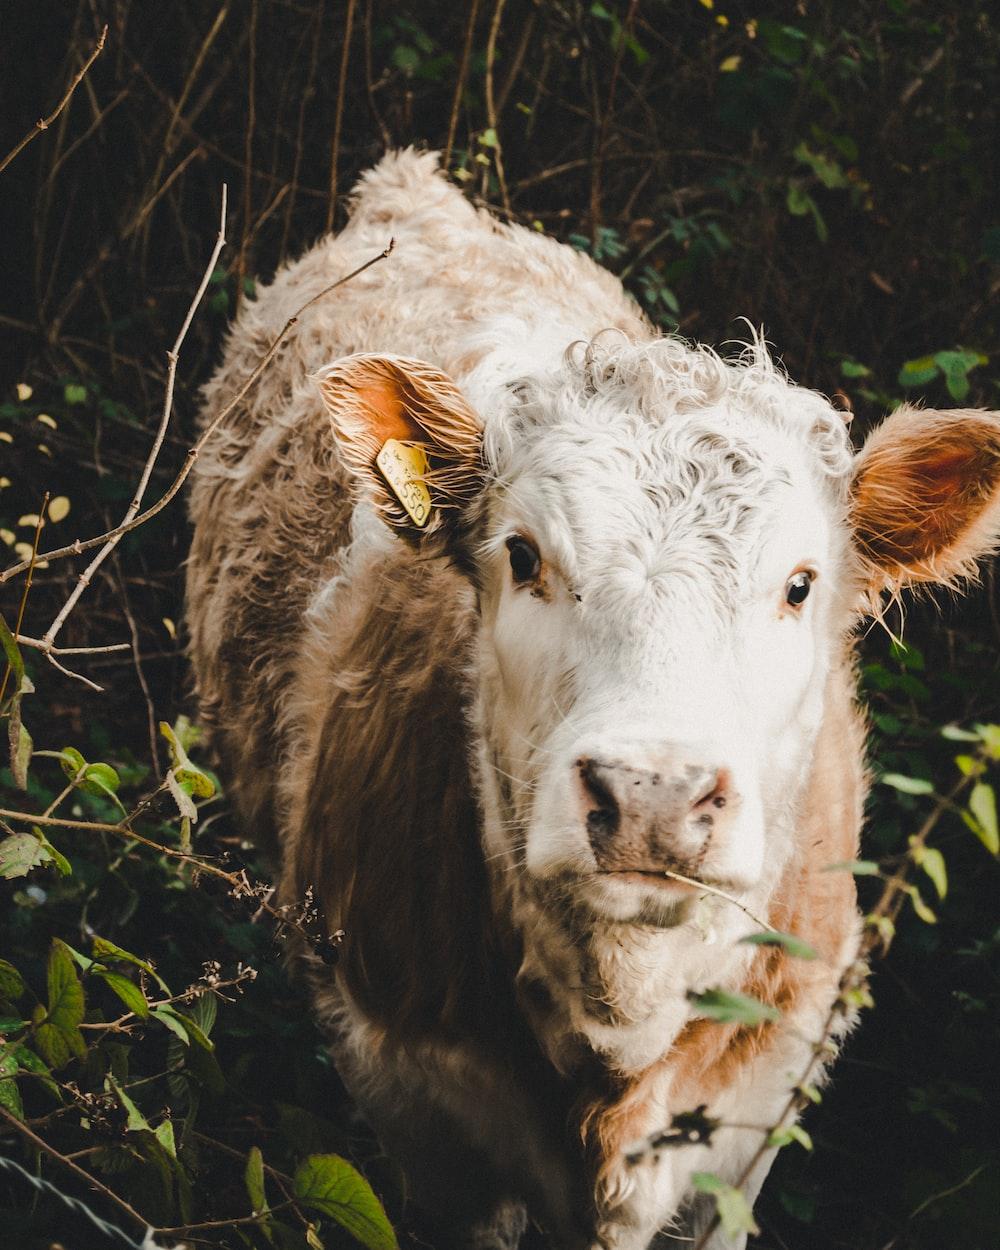 white cattle beside green plant